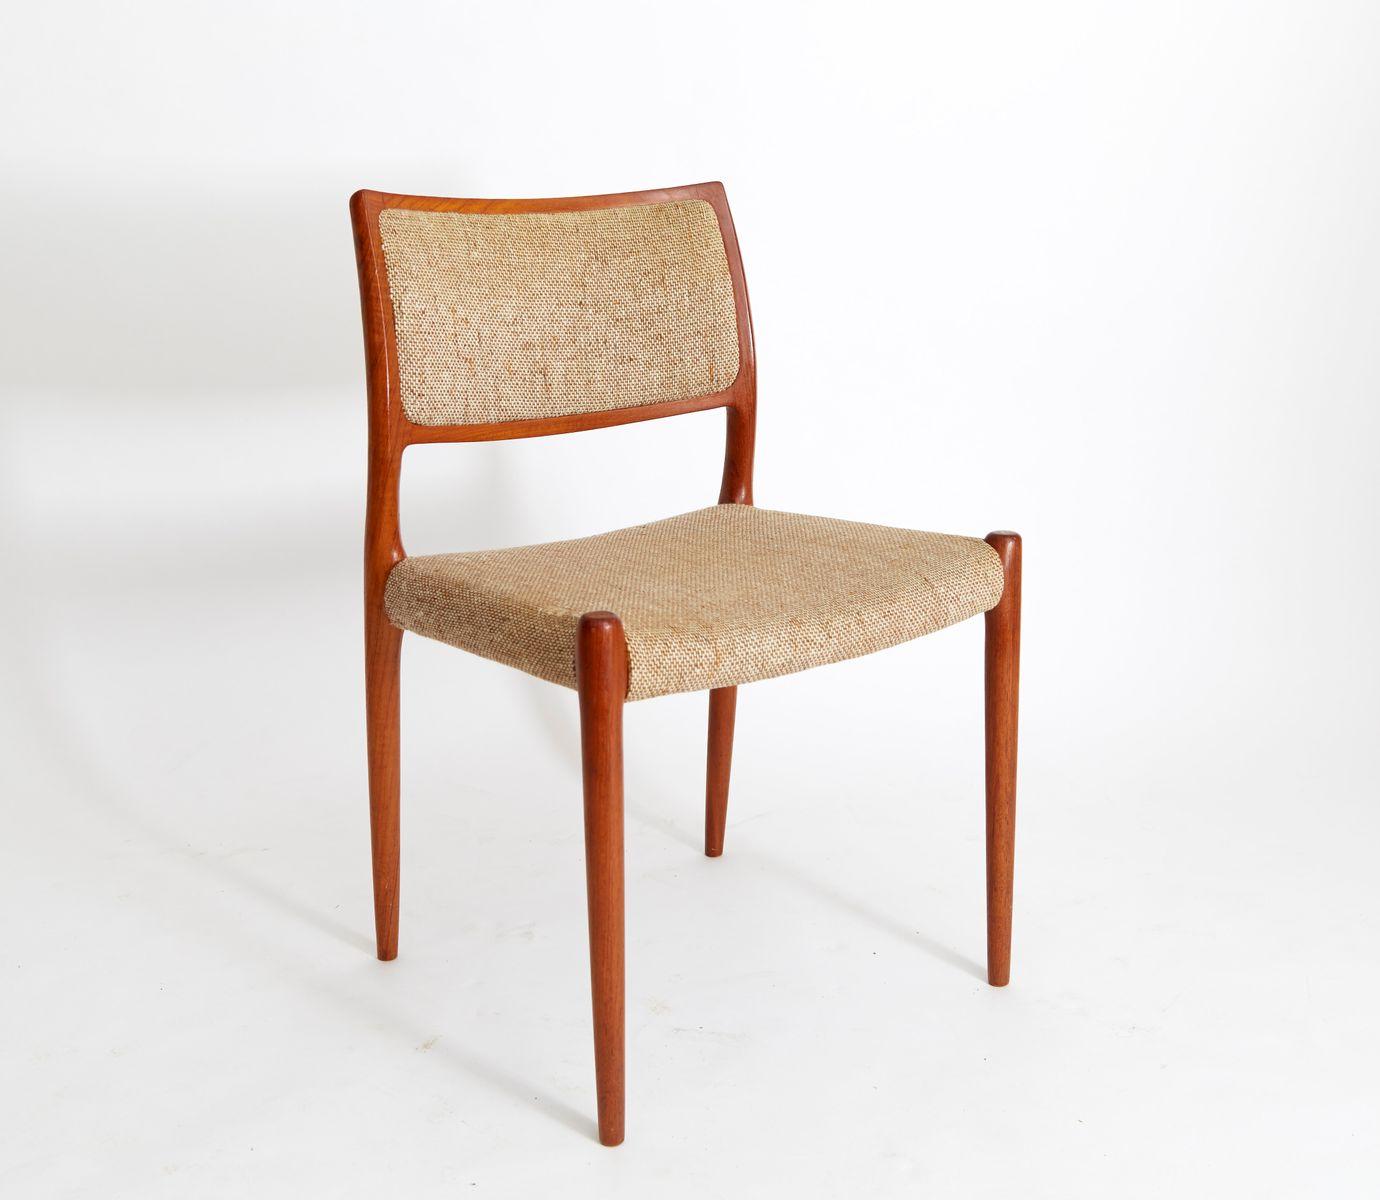 Vintage danish teak dining chairs by niels otto møller